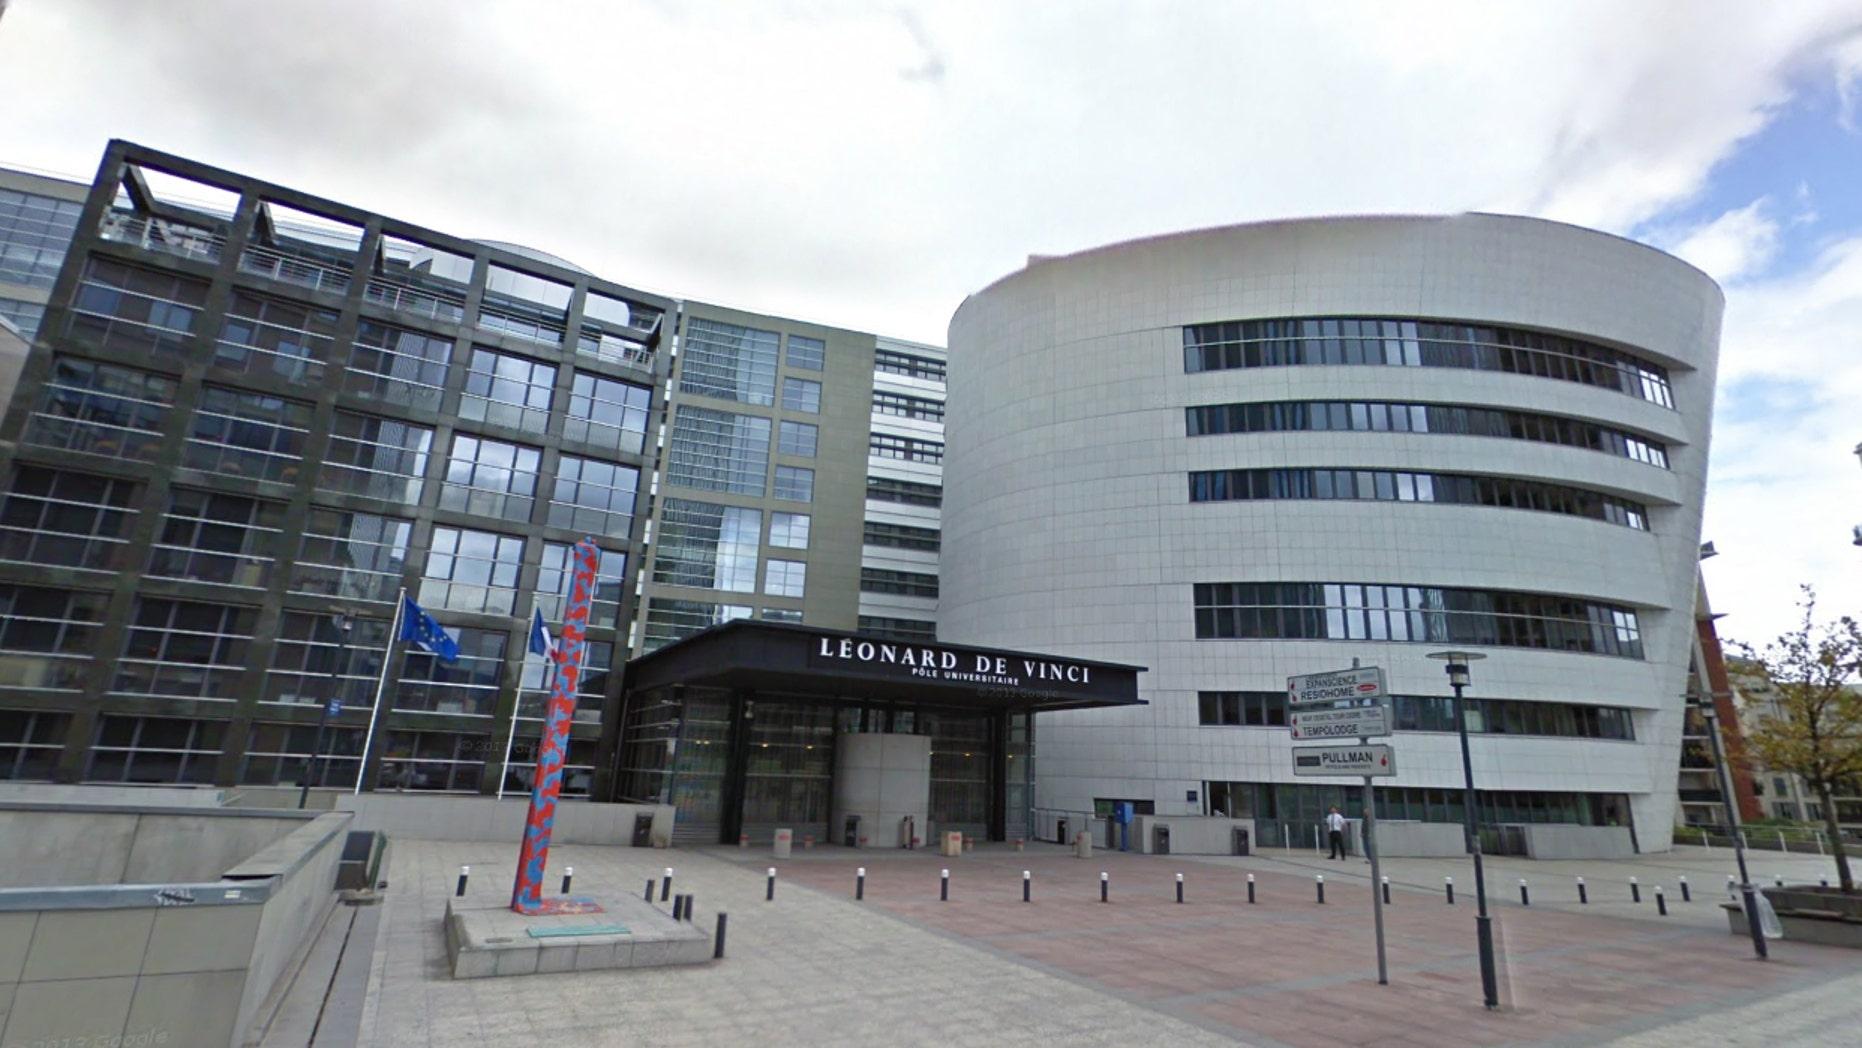 John Dowling, an Irish teacher, was stabbed to death outside the Pôle Universitaire Léonard de Vinci in Paris on Wednesday, Dec. 5, 2018.